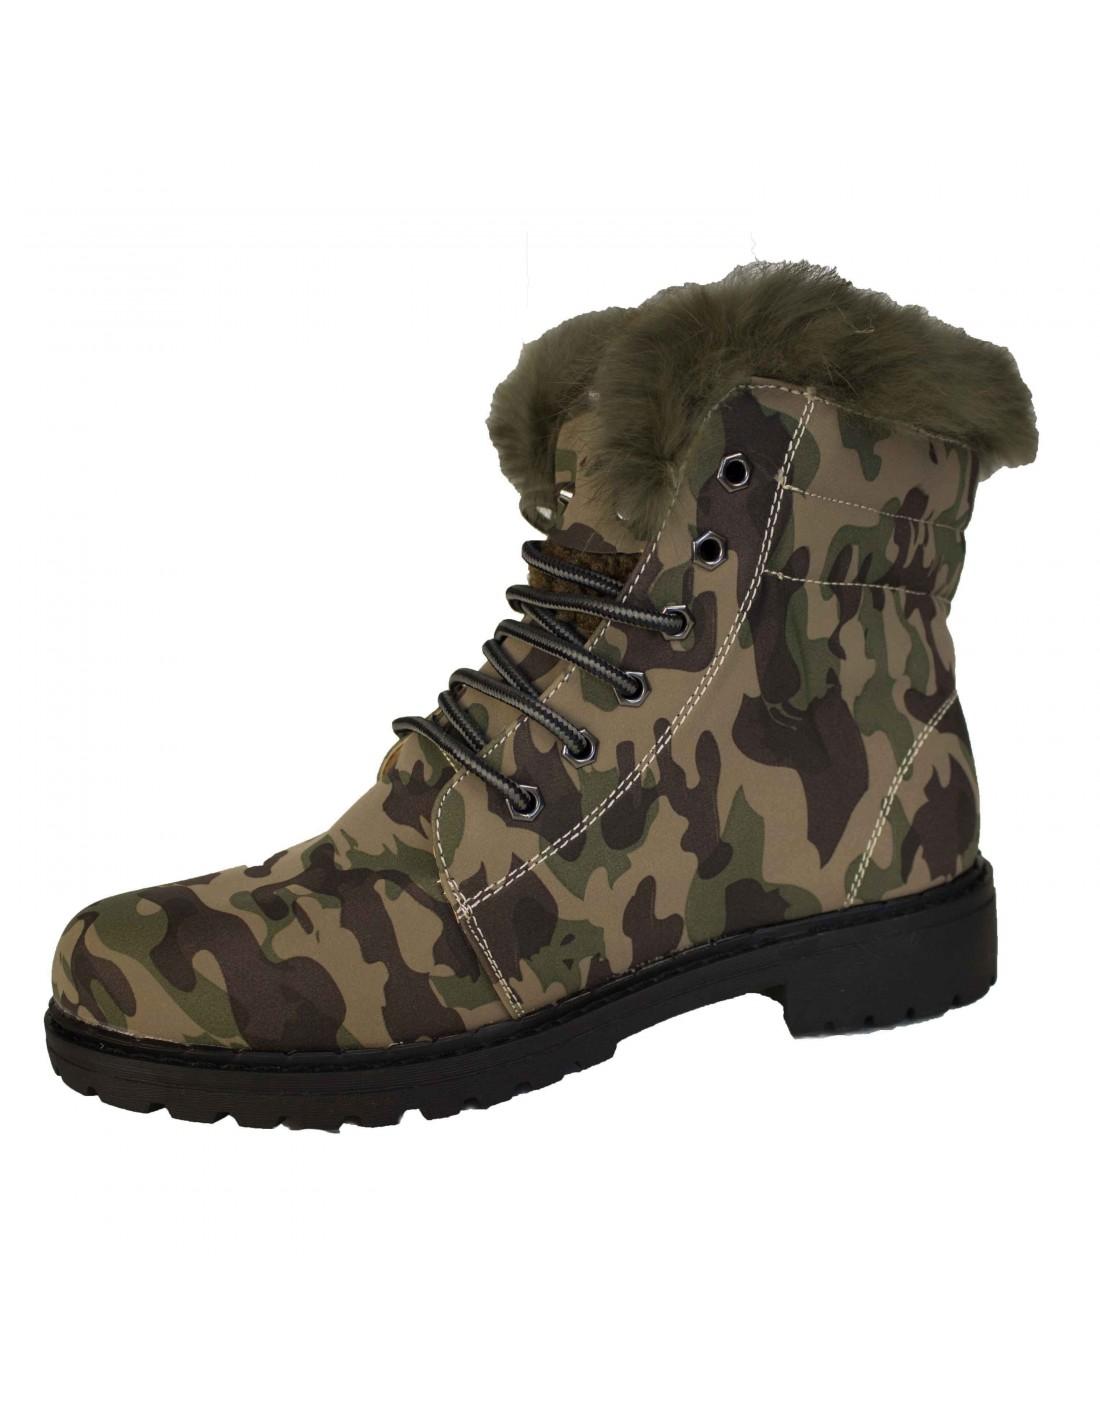 femme fourrée rangers camouflage Bottines army militaire JulFc1TK3